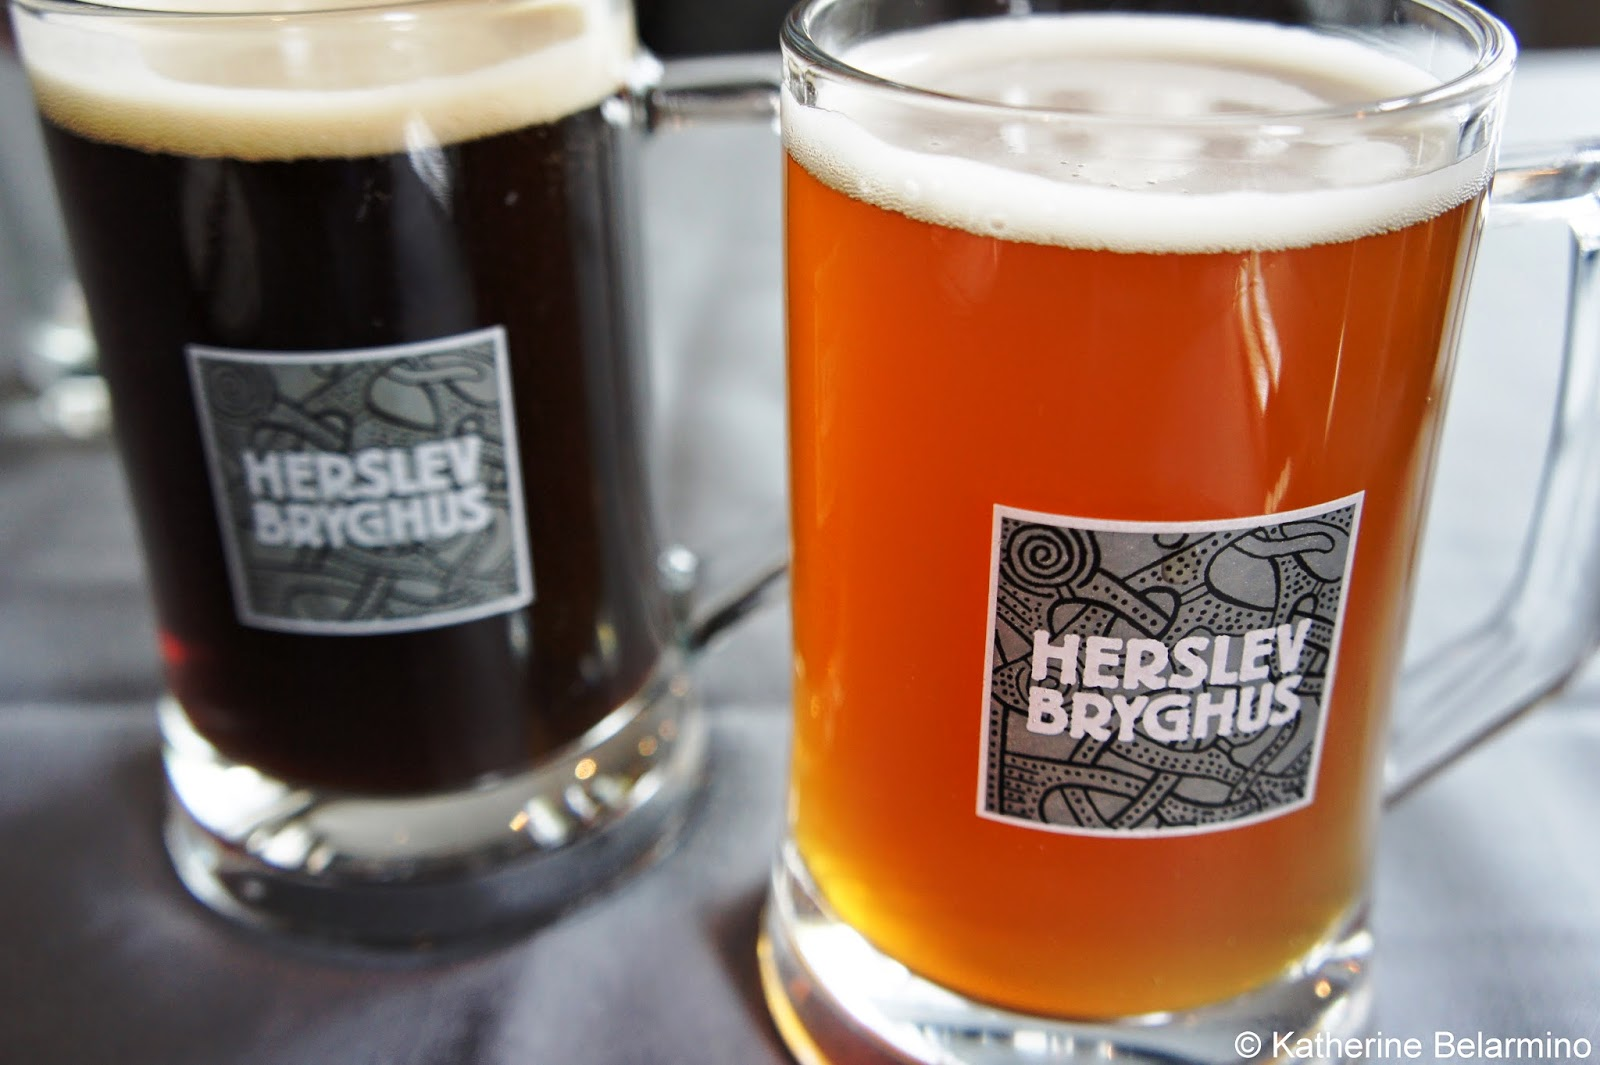 Herslev Bryghus Danish Beer at Gourmethuset Store Bors Roskilde Denmark